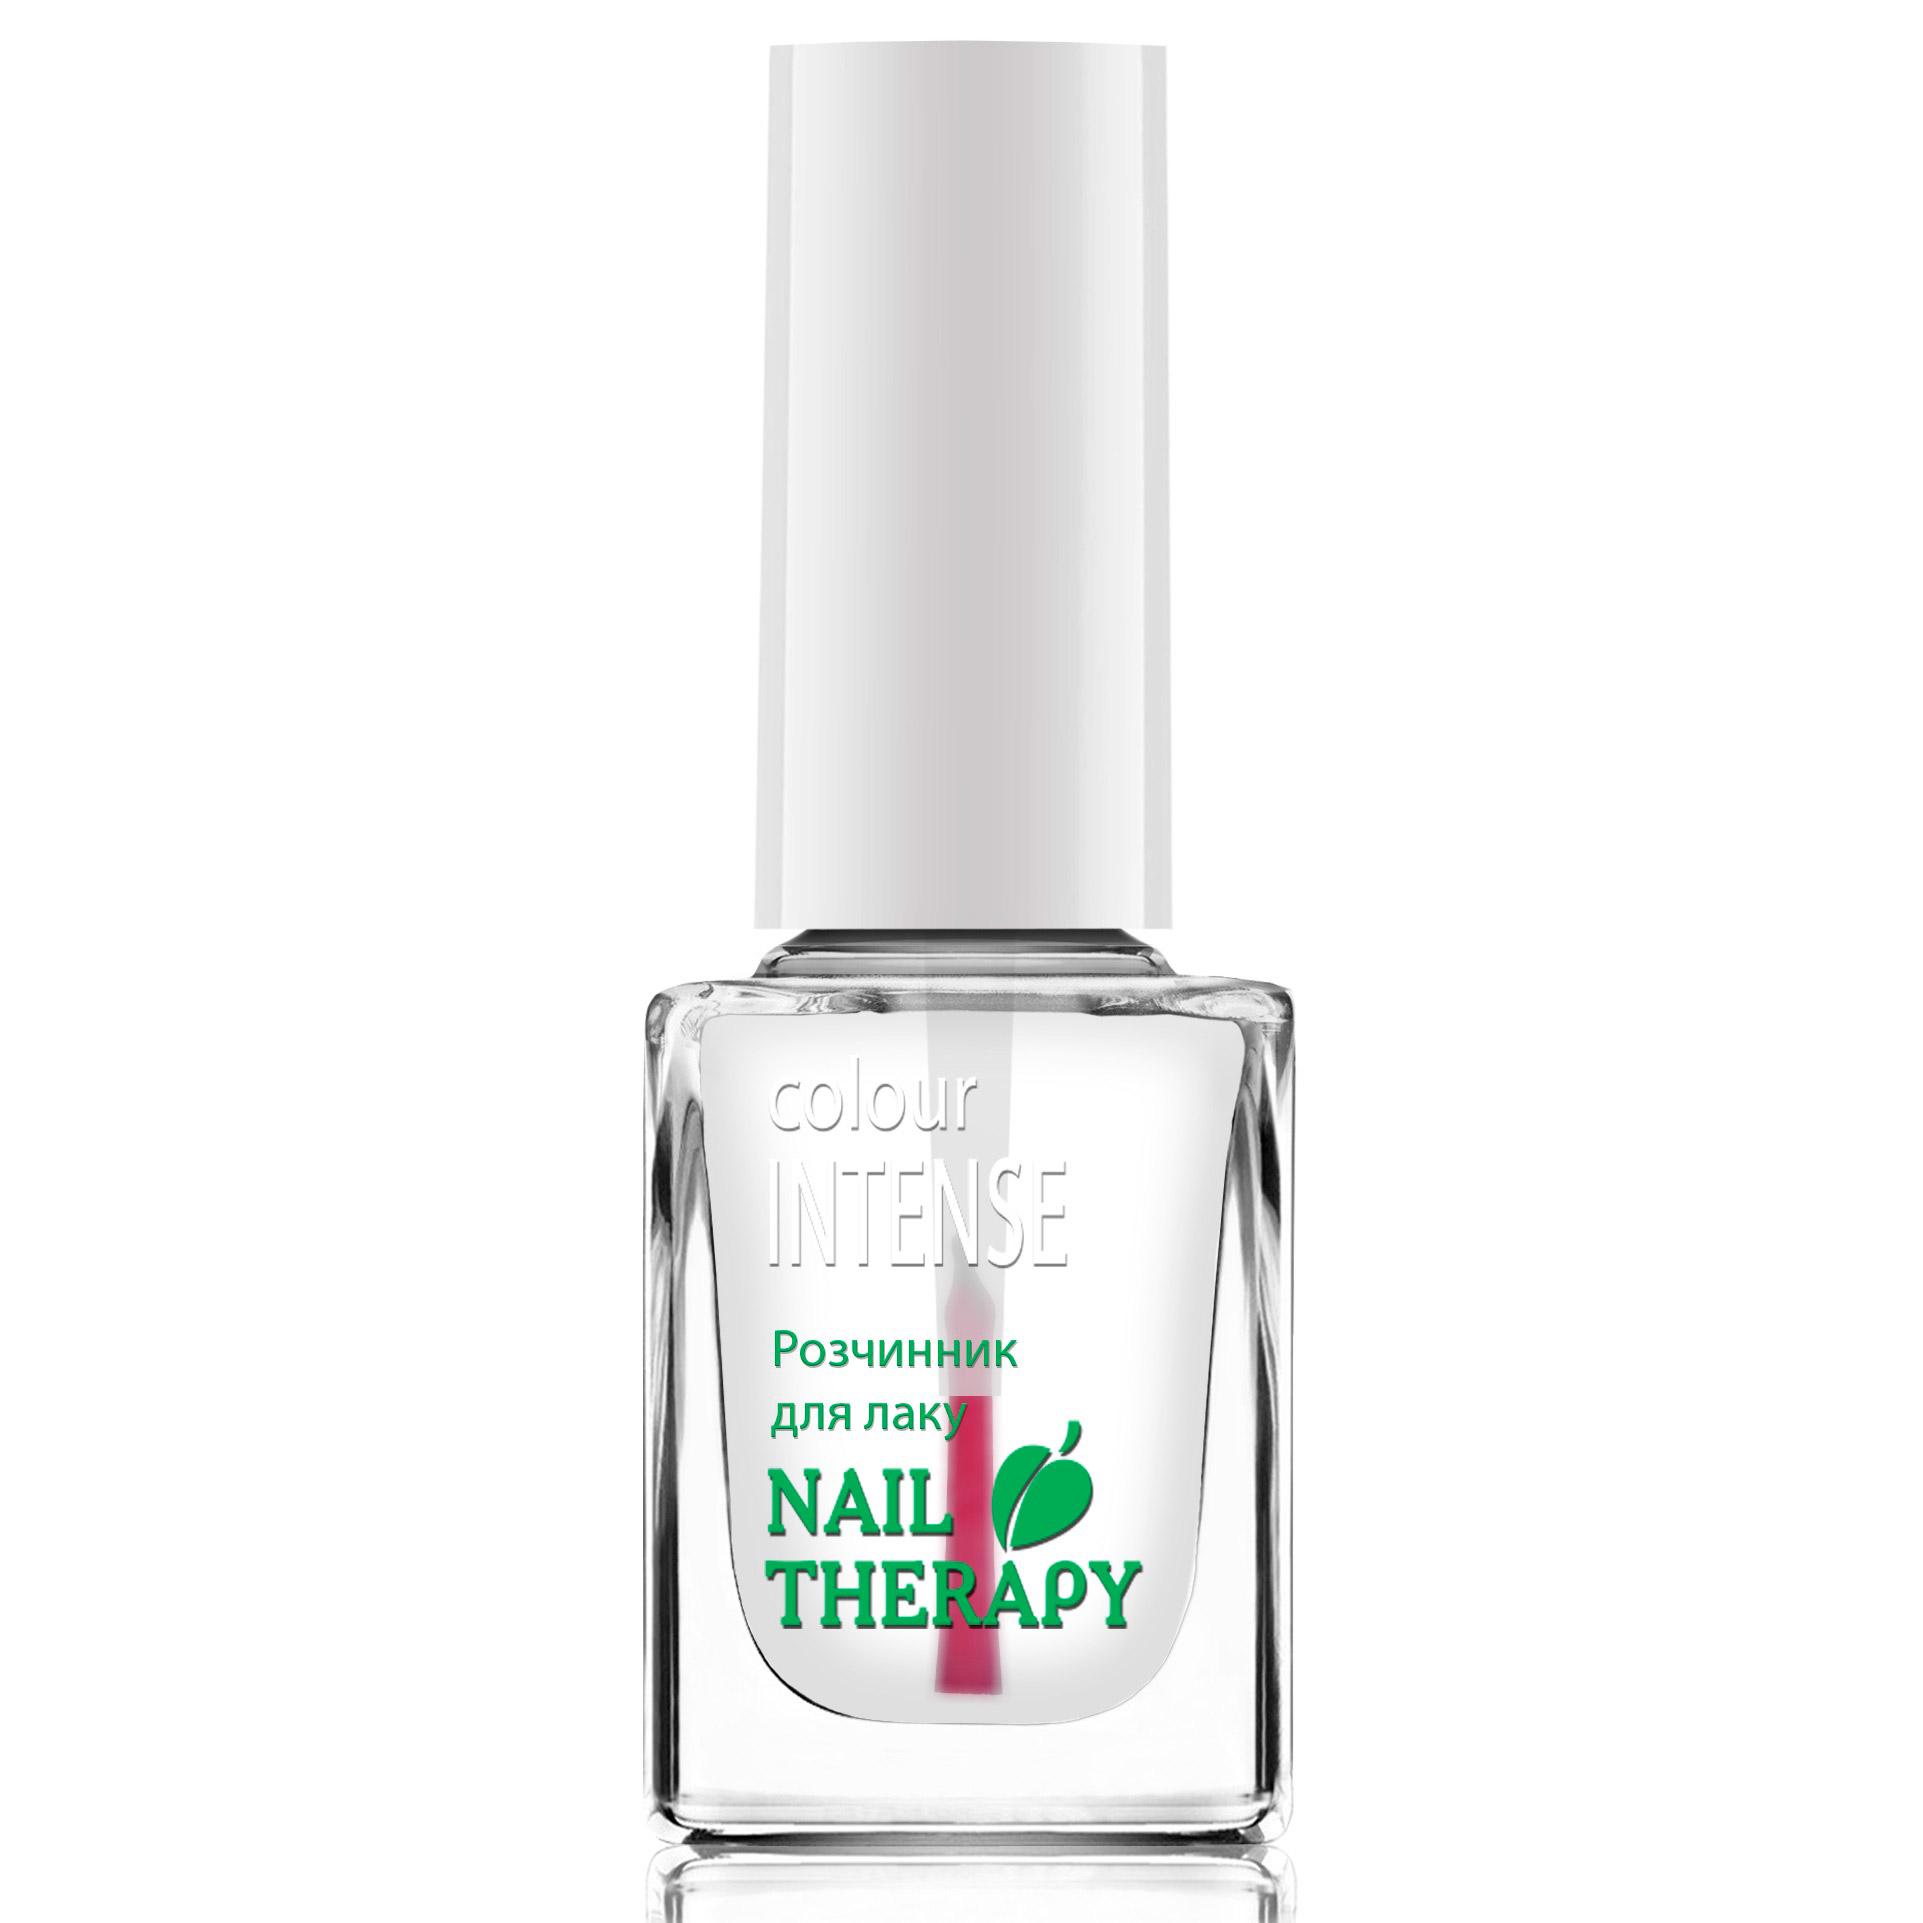 Разбавитель для лака Color Intense Nail Therapy NP-05 200 13 мл Colour Intense